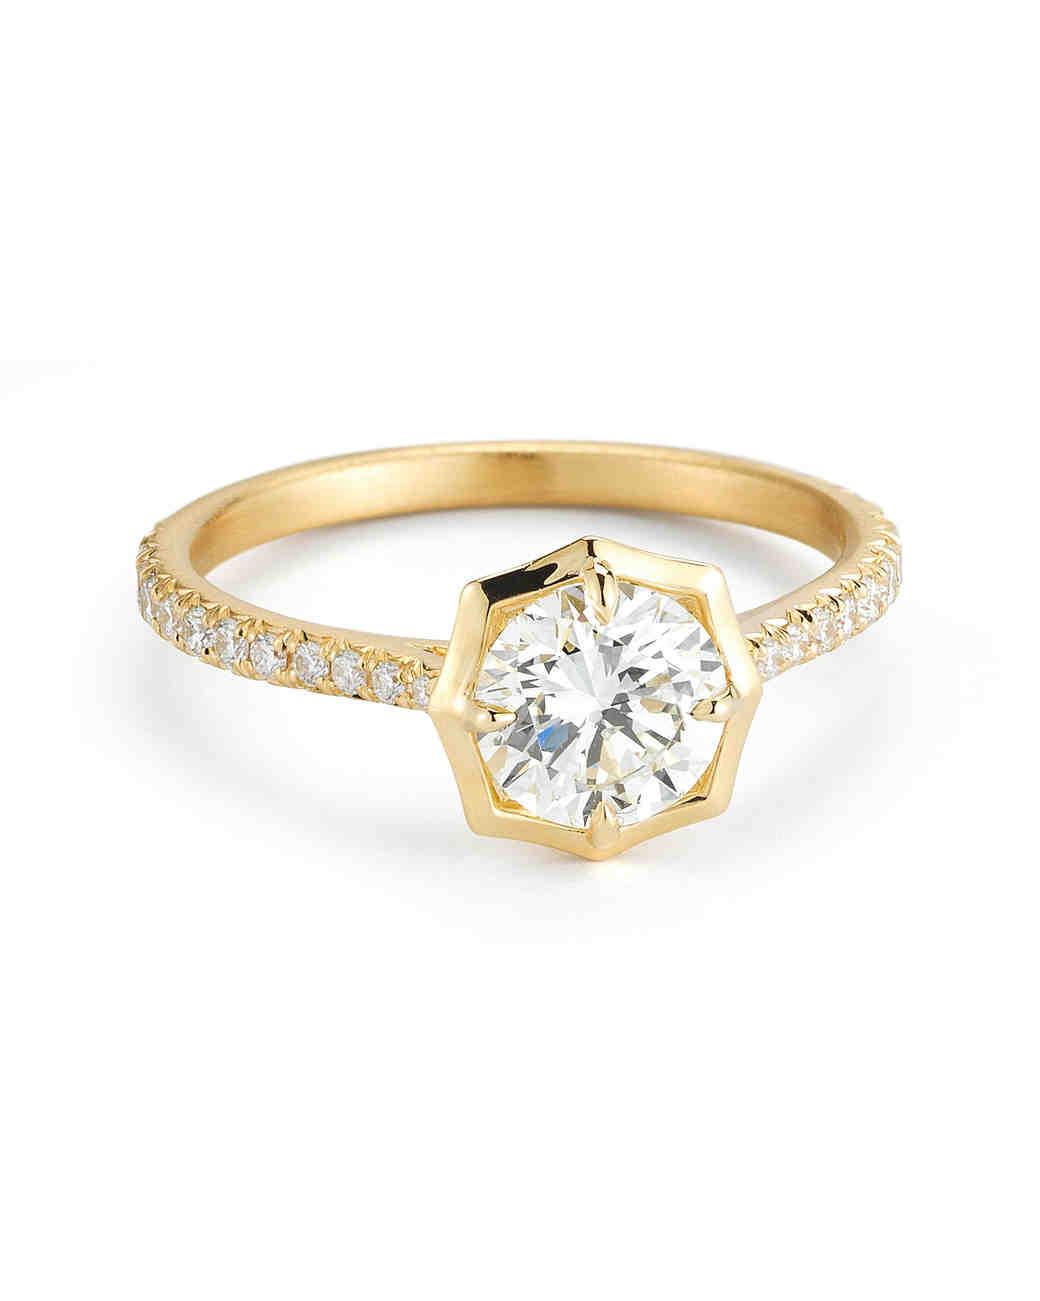 yellow gold engagement rings | martha stewart weddings cbfydpf